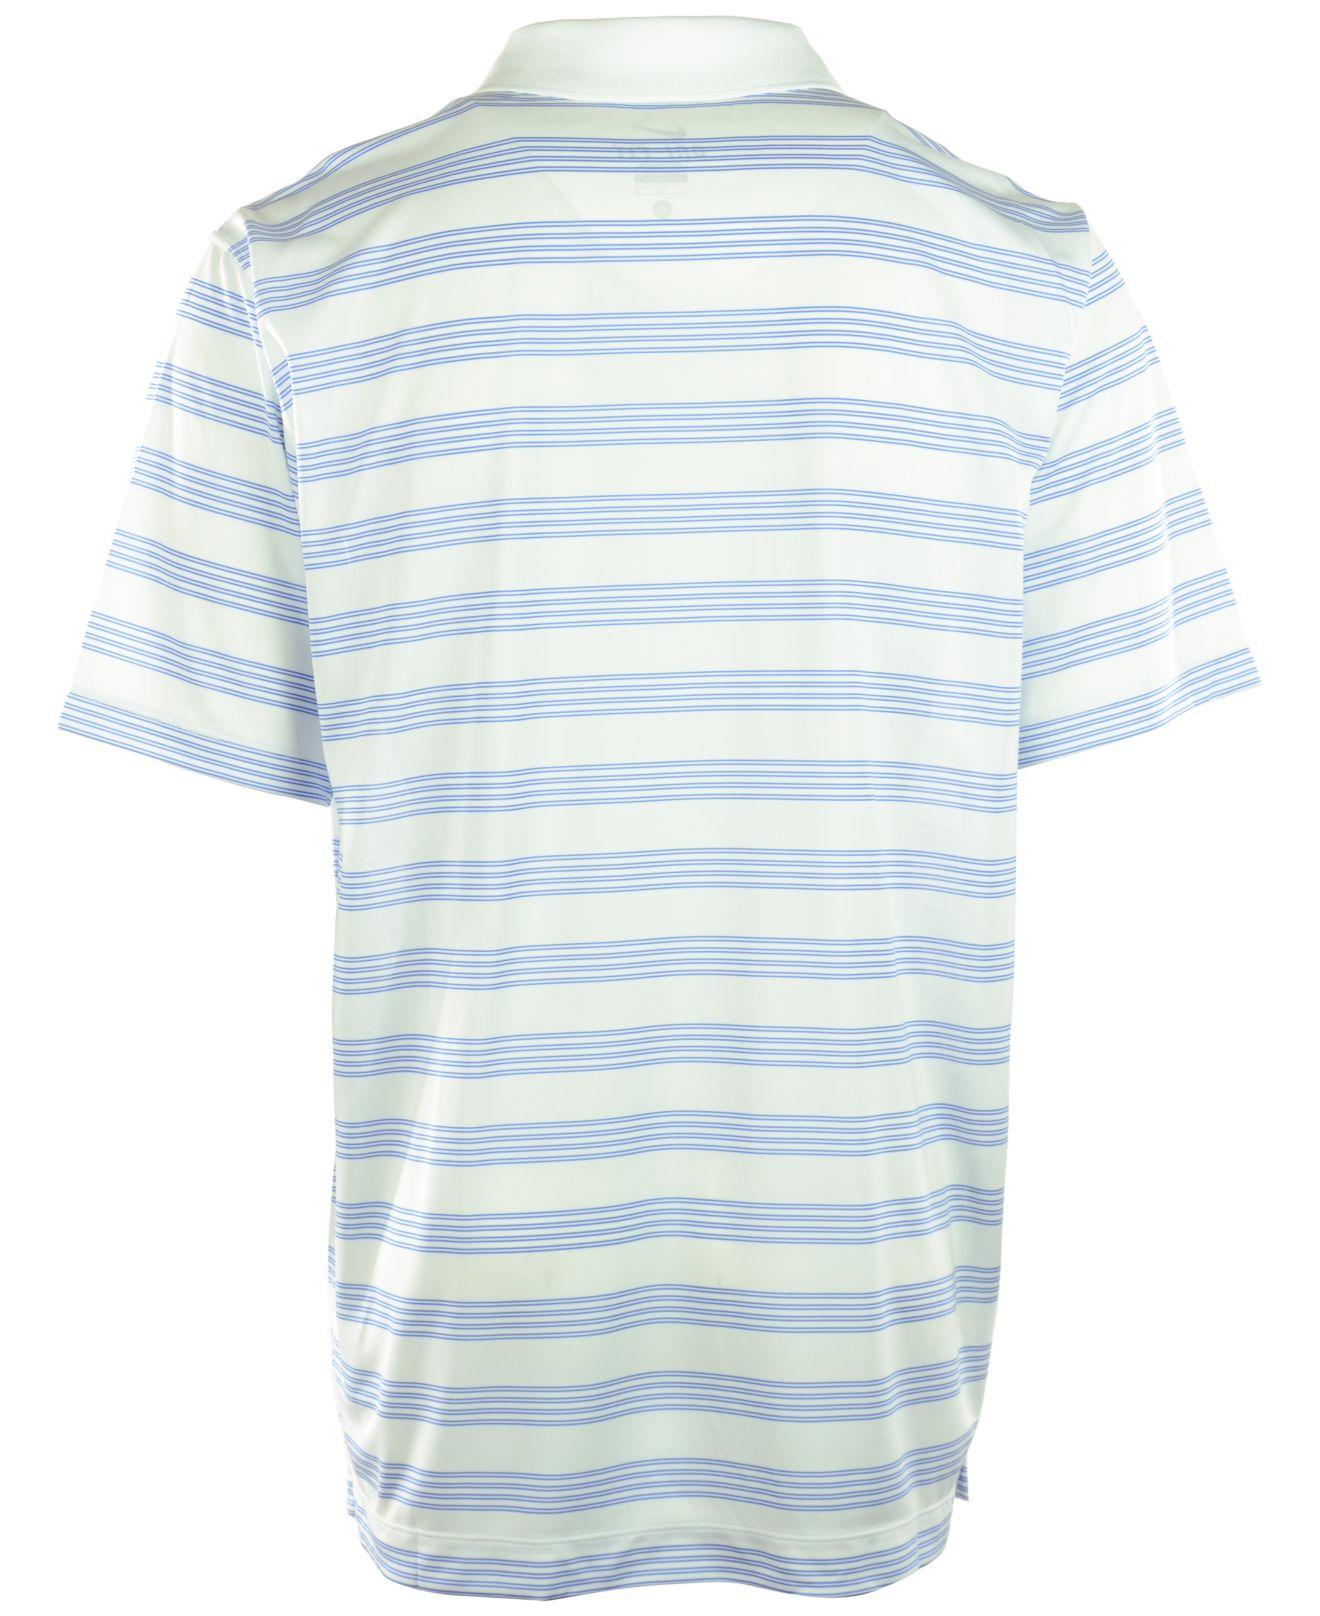 nike-white-mens-short-sleeve-duke-blue-devils-preseason-polo-product-1-21879200-0-654039200-normal.jpeg